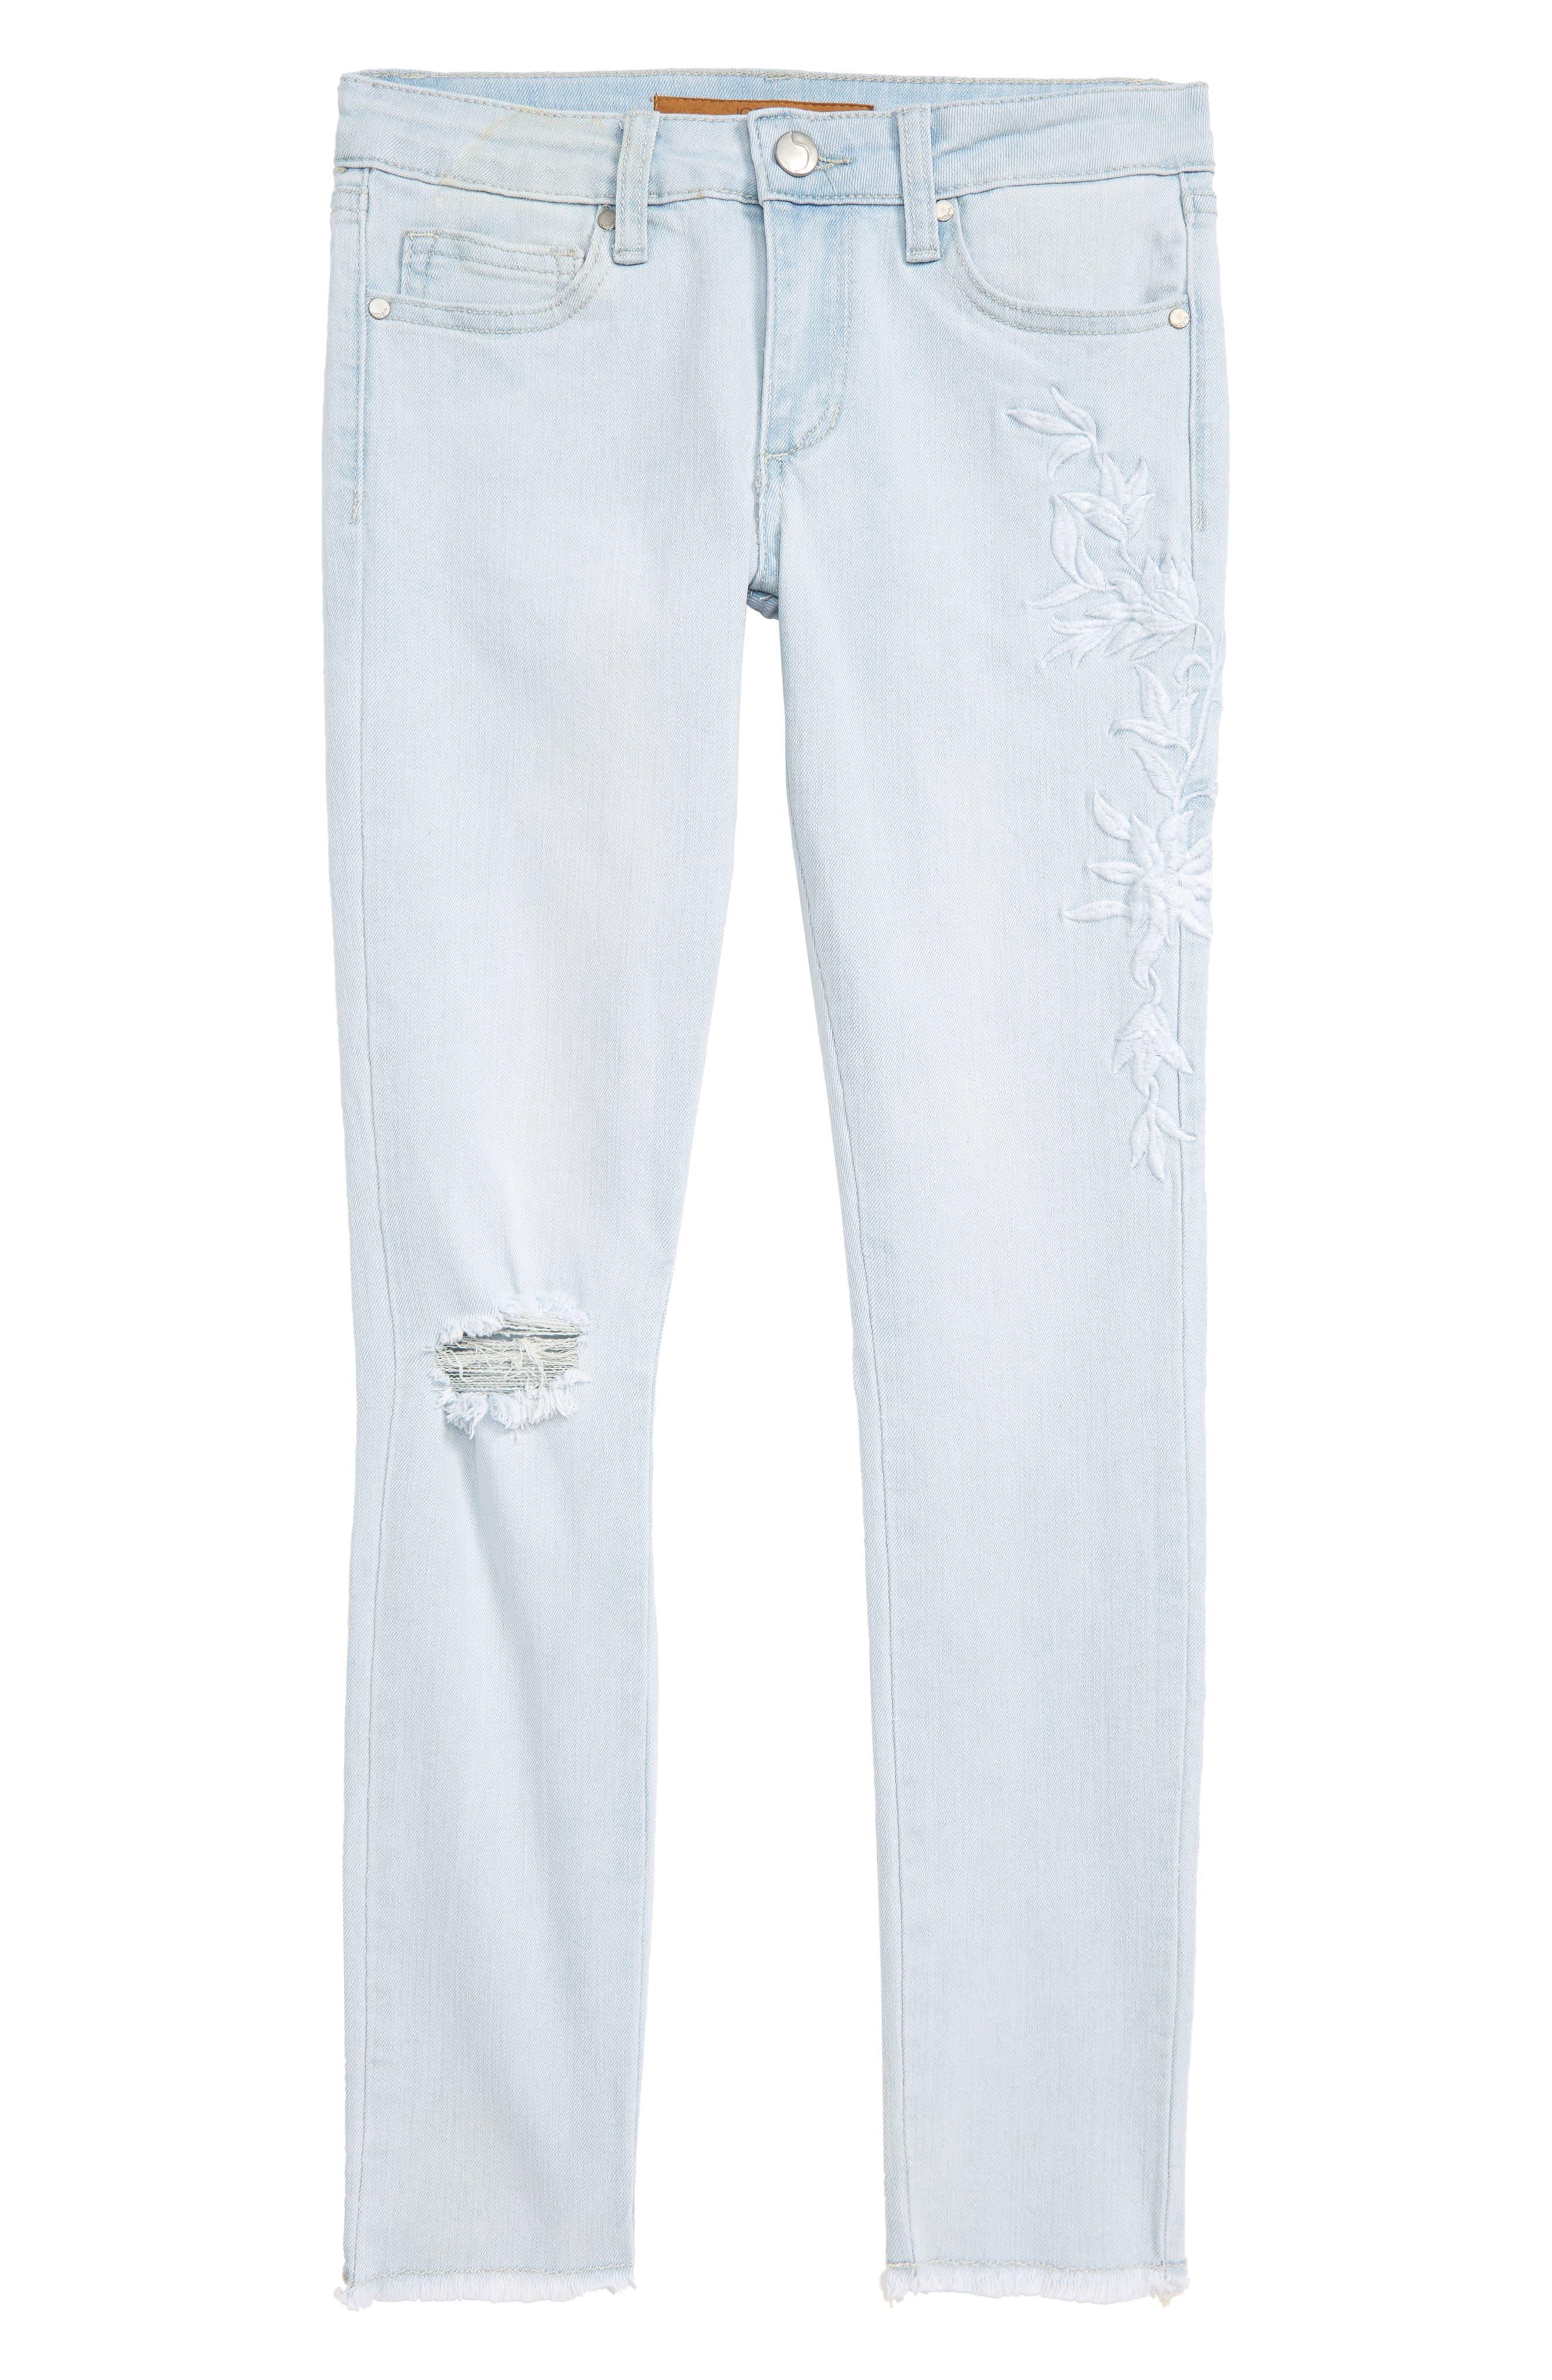 JOE'S The Markie Ankle Skinny Jeans, Main, color, ELIN